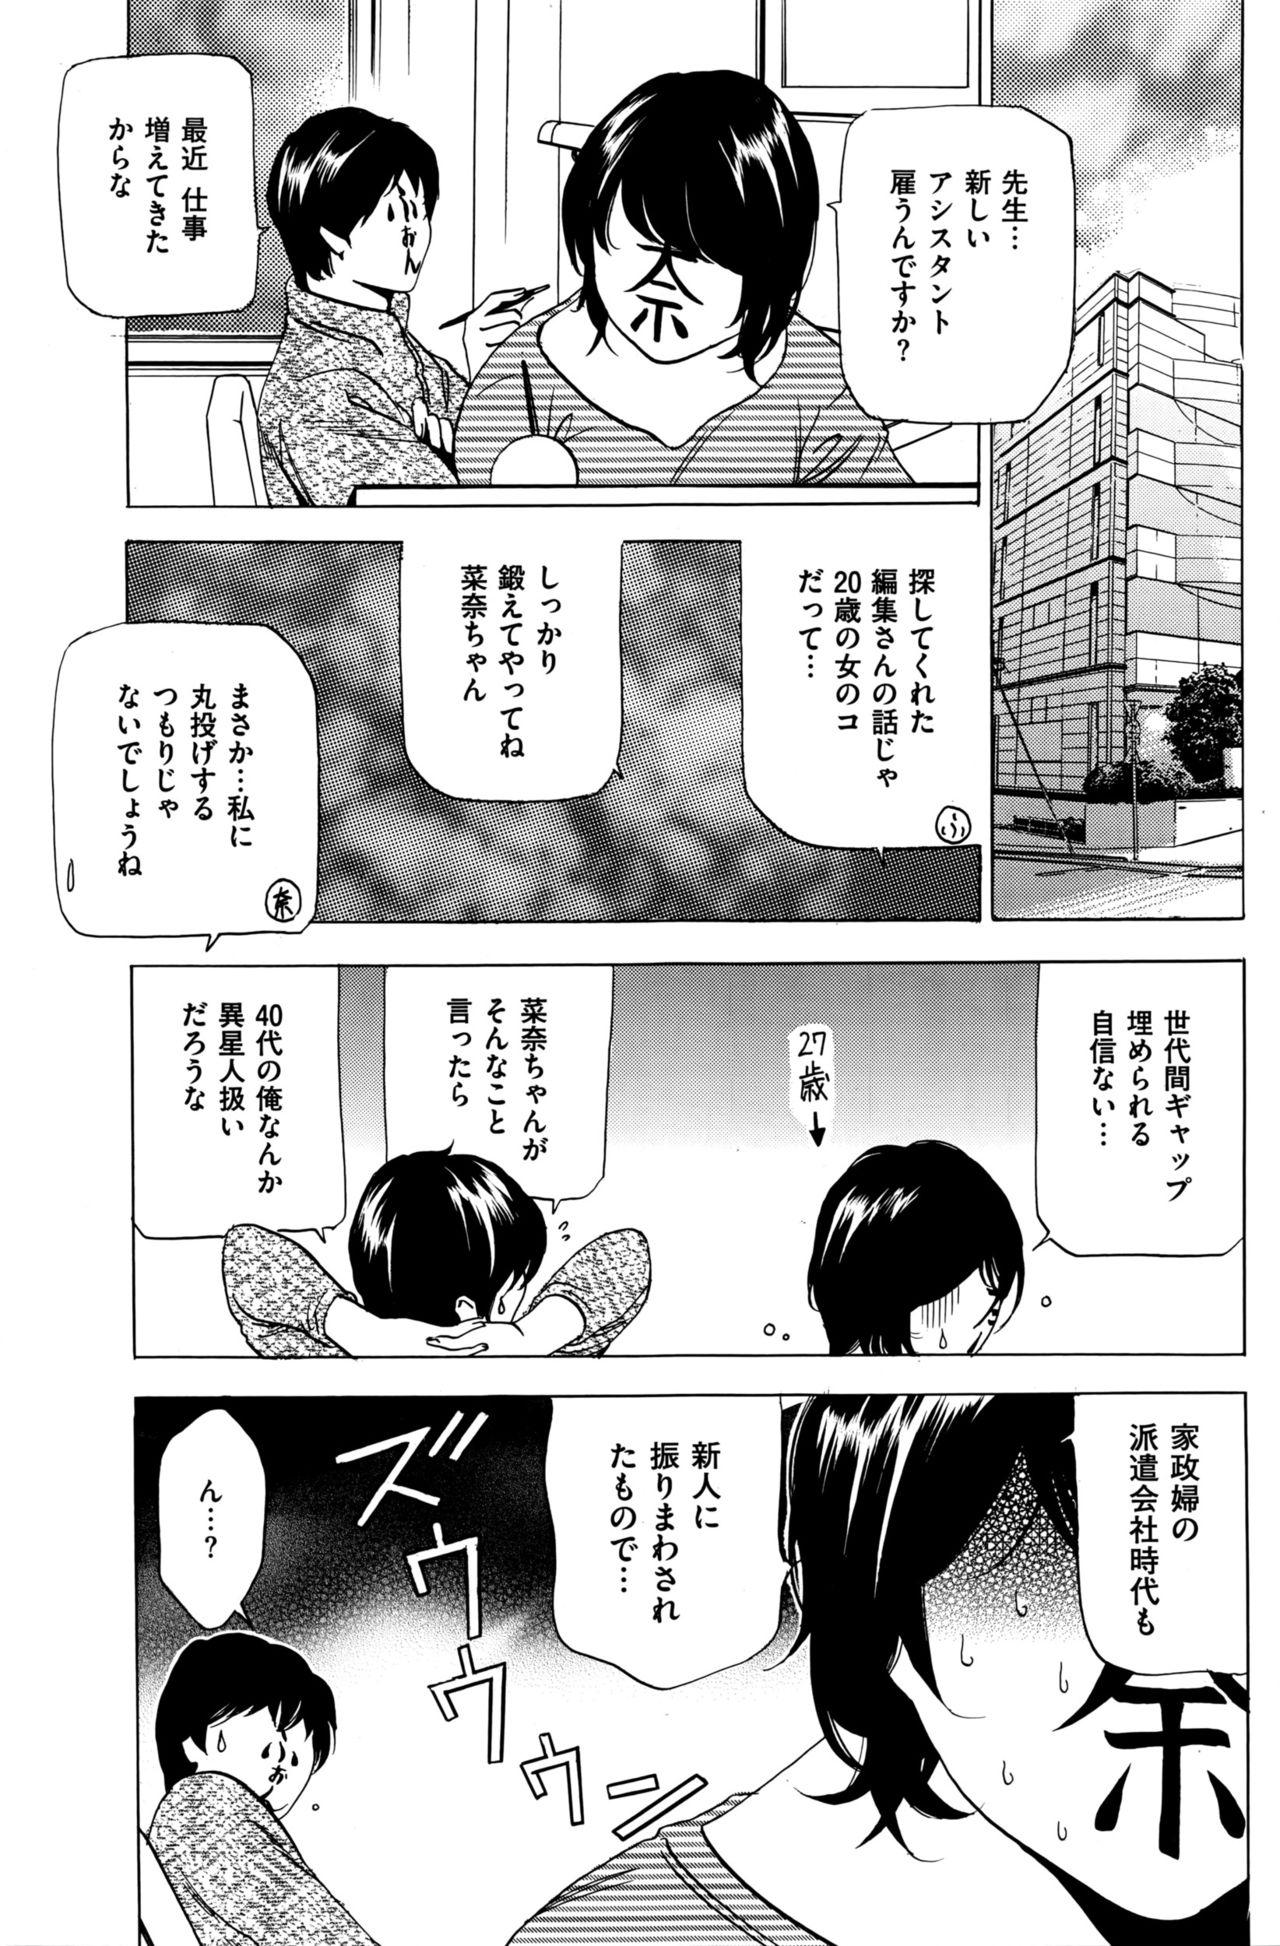 Wa Usuki Ipa a 1-10 37